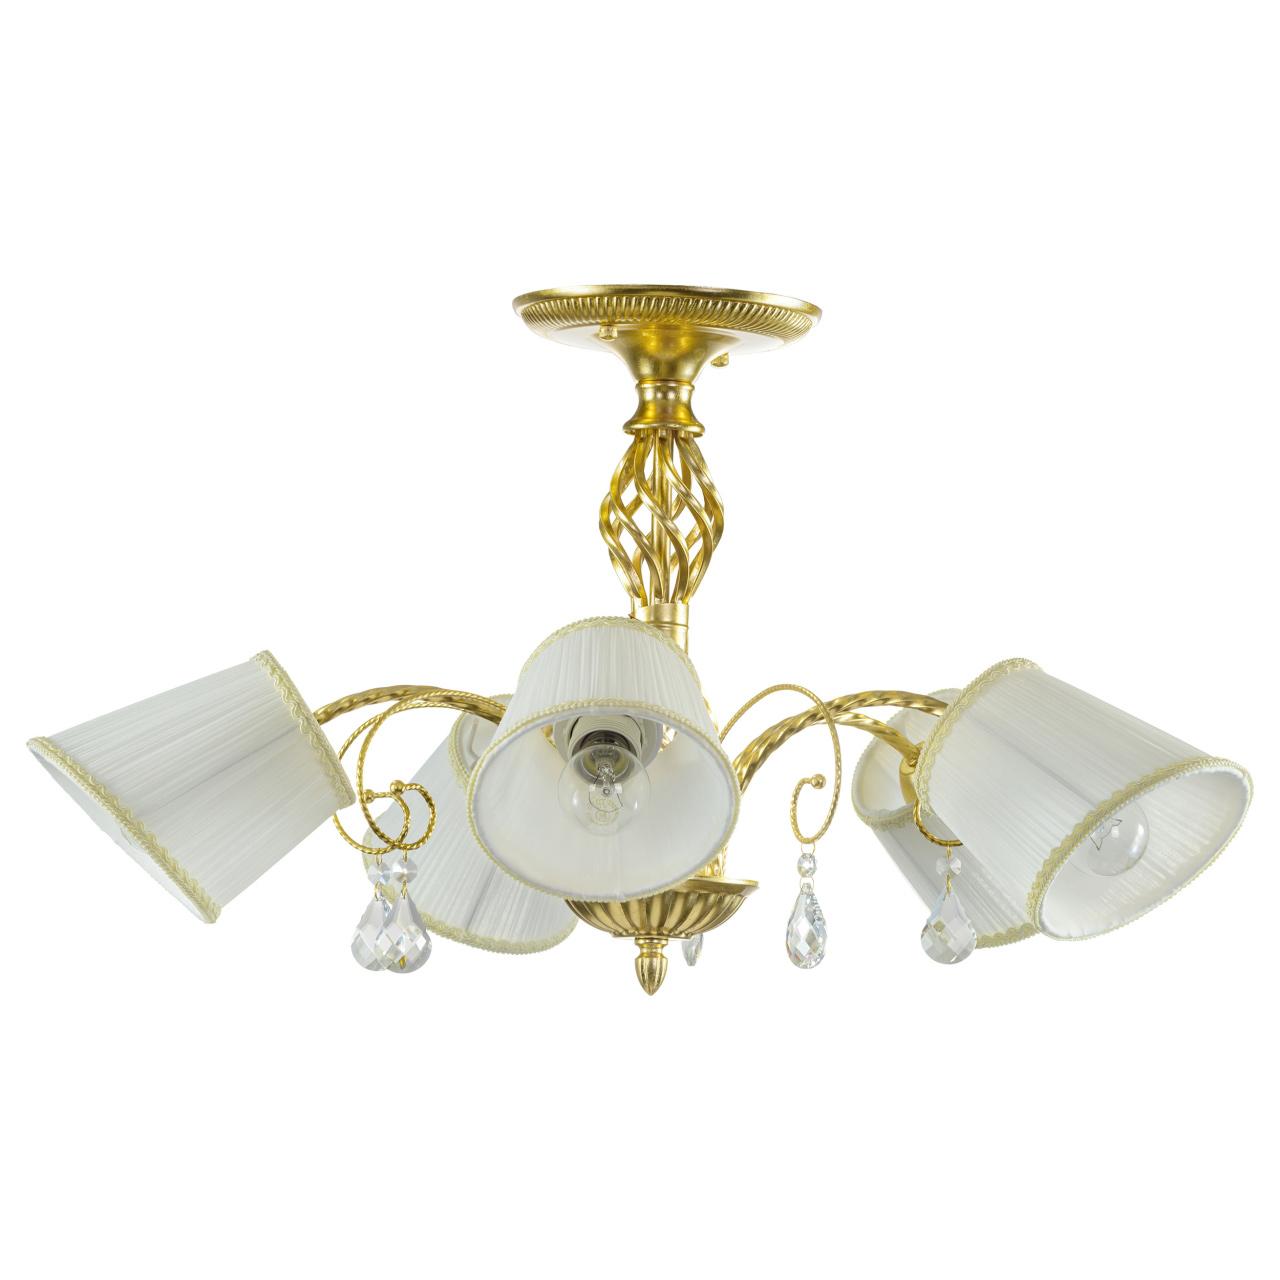 Люстра потолочная Esedra 5x40W E27 gold foil ткань Lightstar 796053